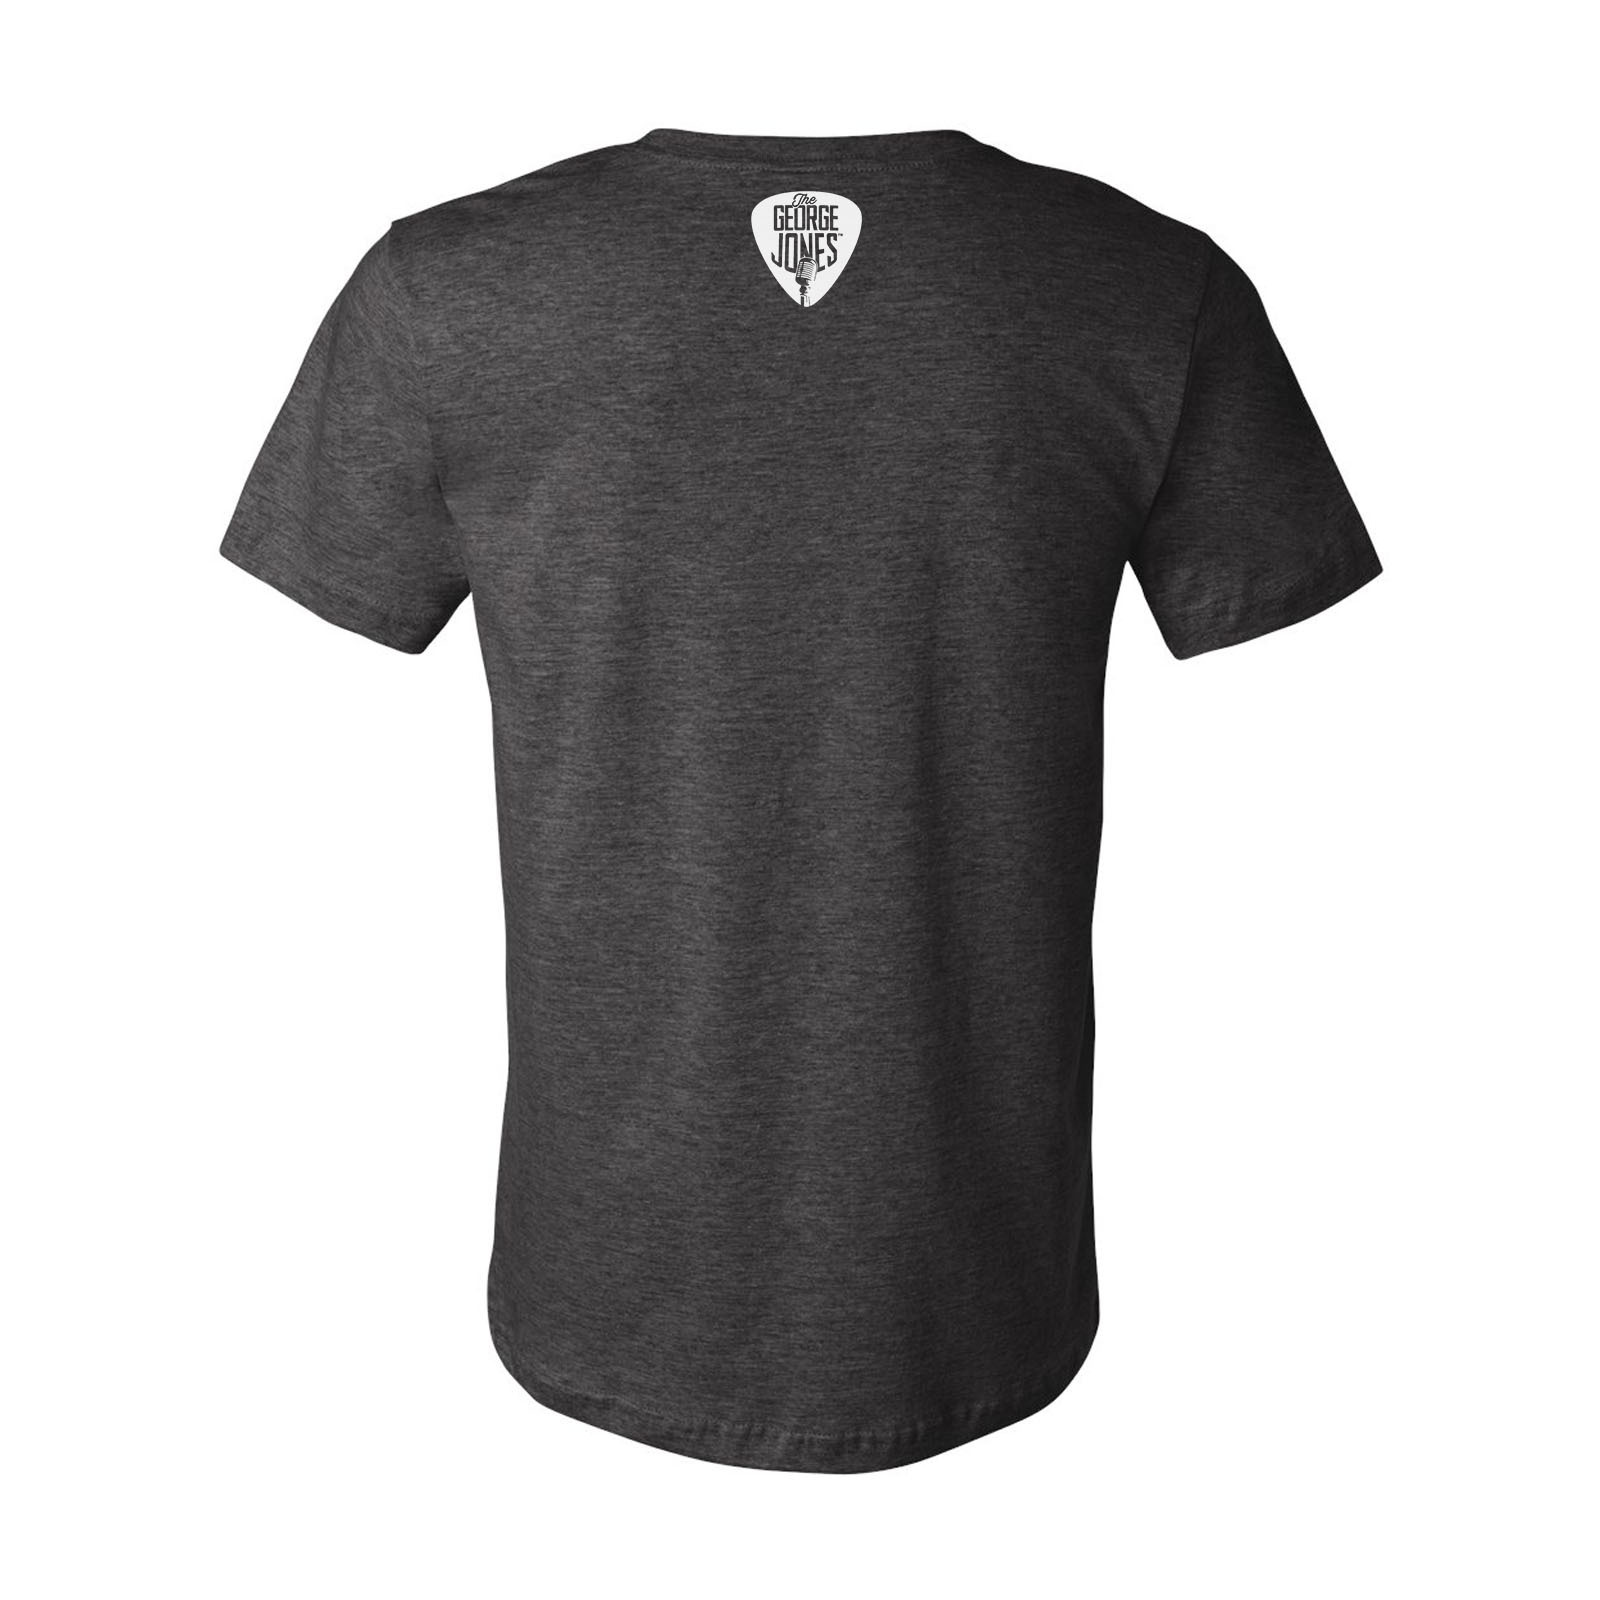 George Jones Lawnmower T-Shirt